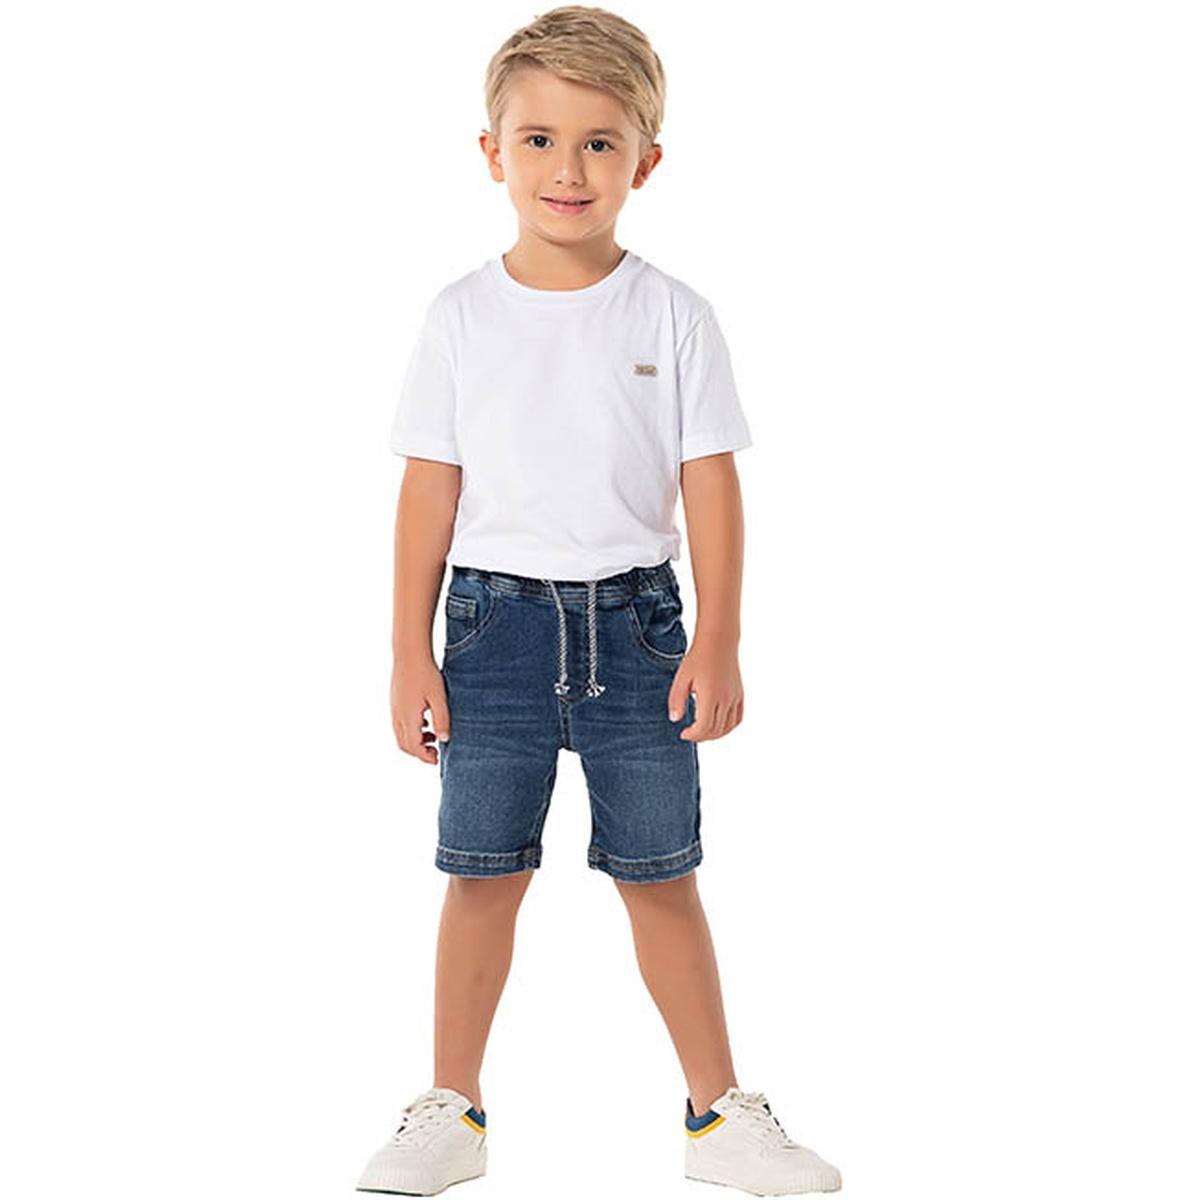 Bermuda Jeans Jogger Menino - Mania Kids